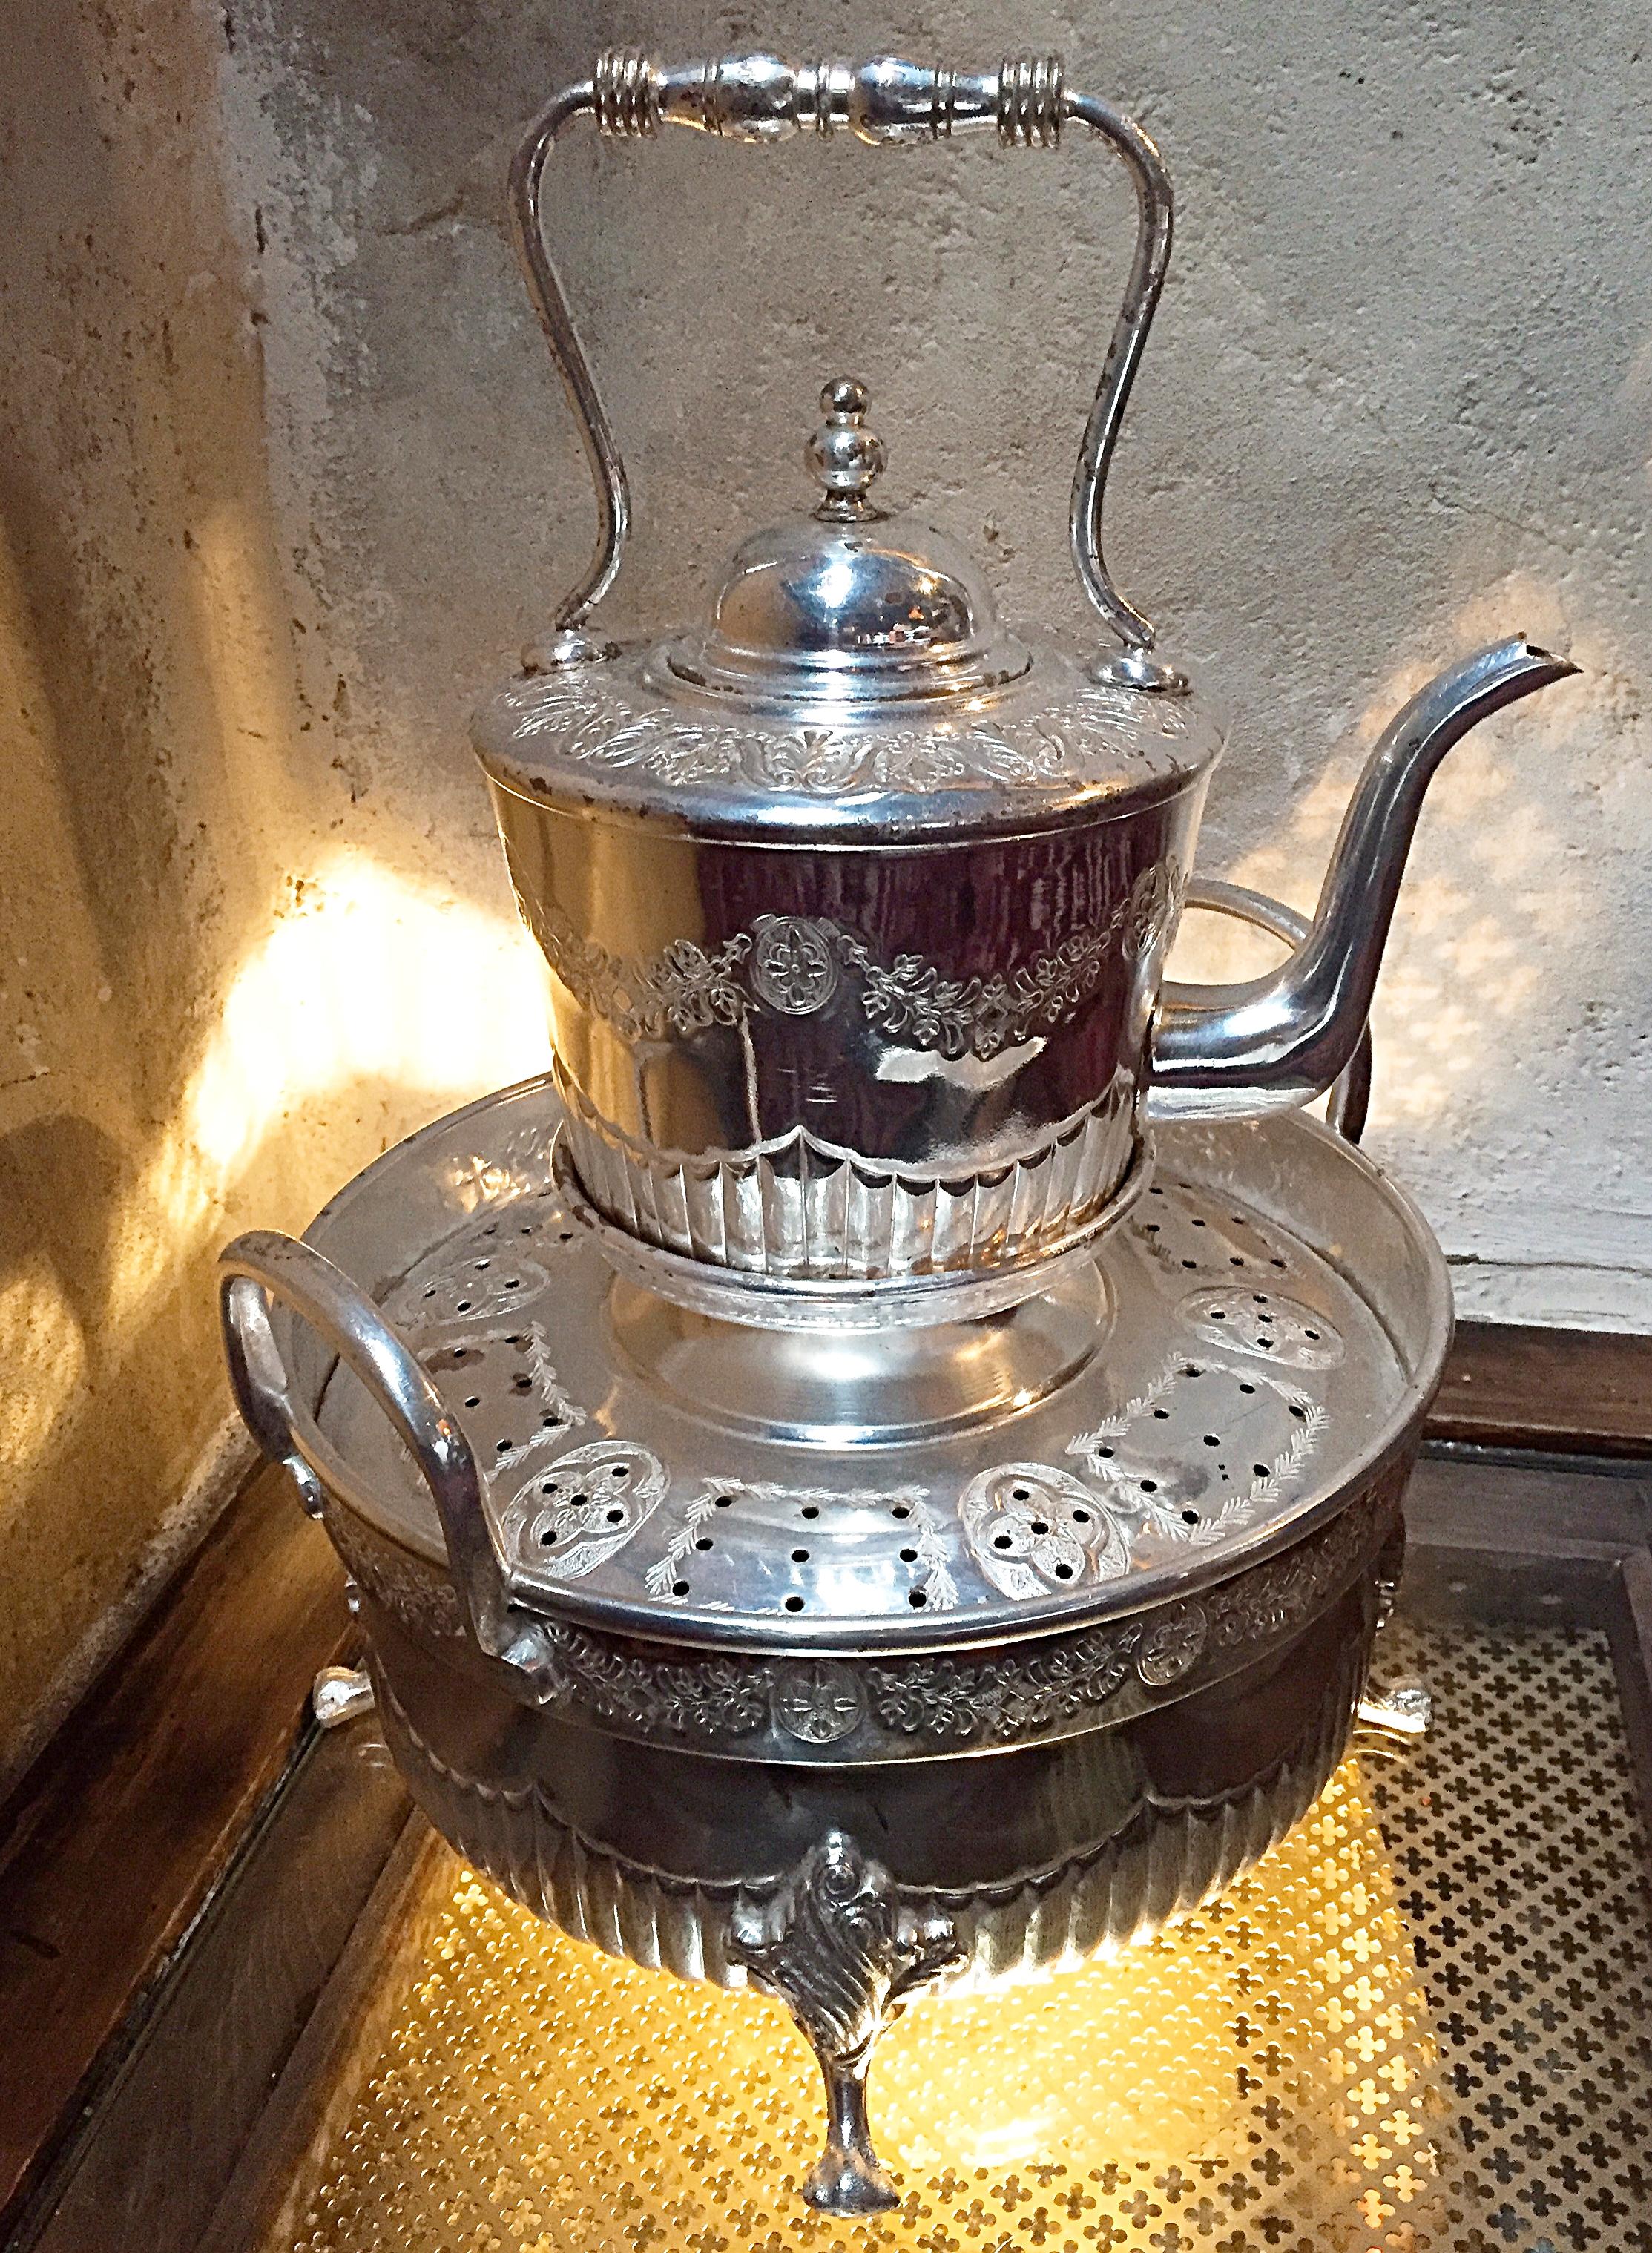 Mint Tea pot - Momo restaurant review, Mayfair London